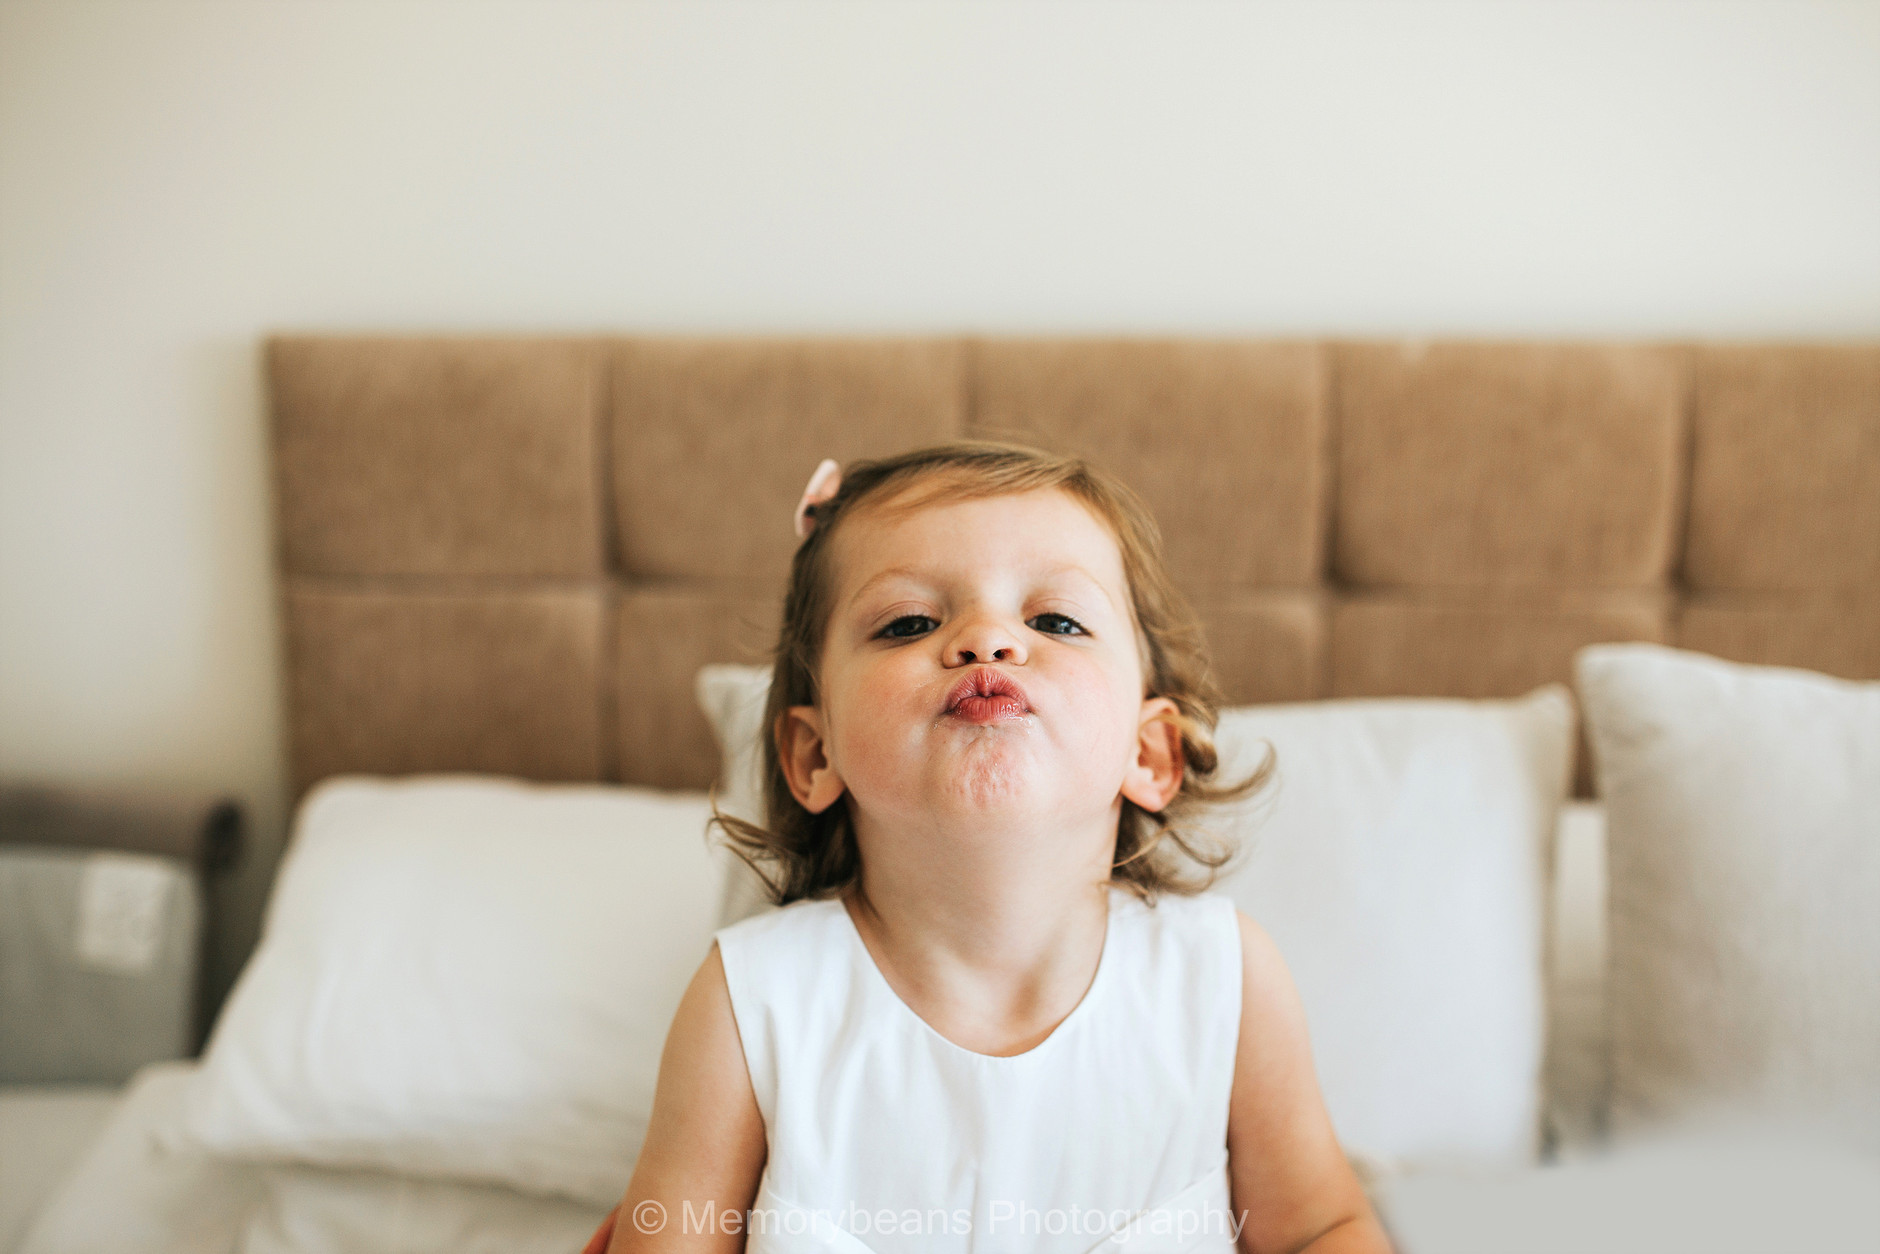 Little girl sending a kiss at the camera